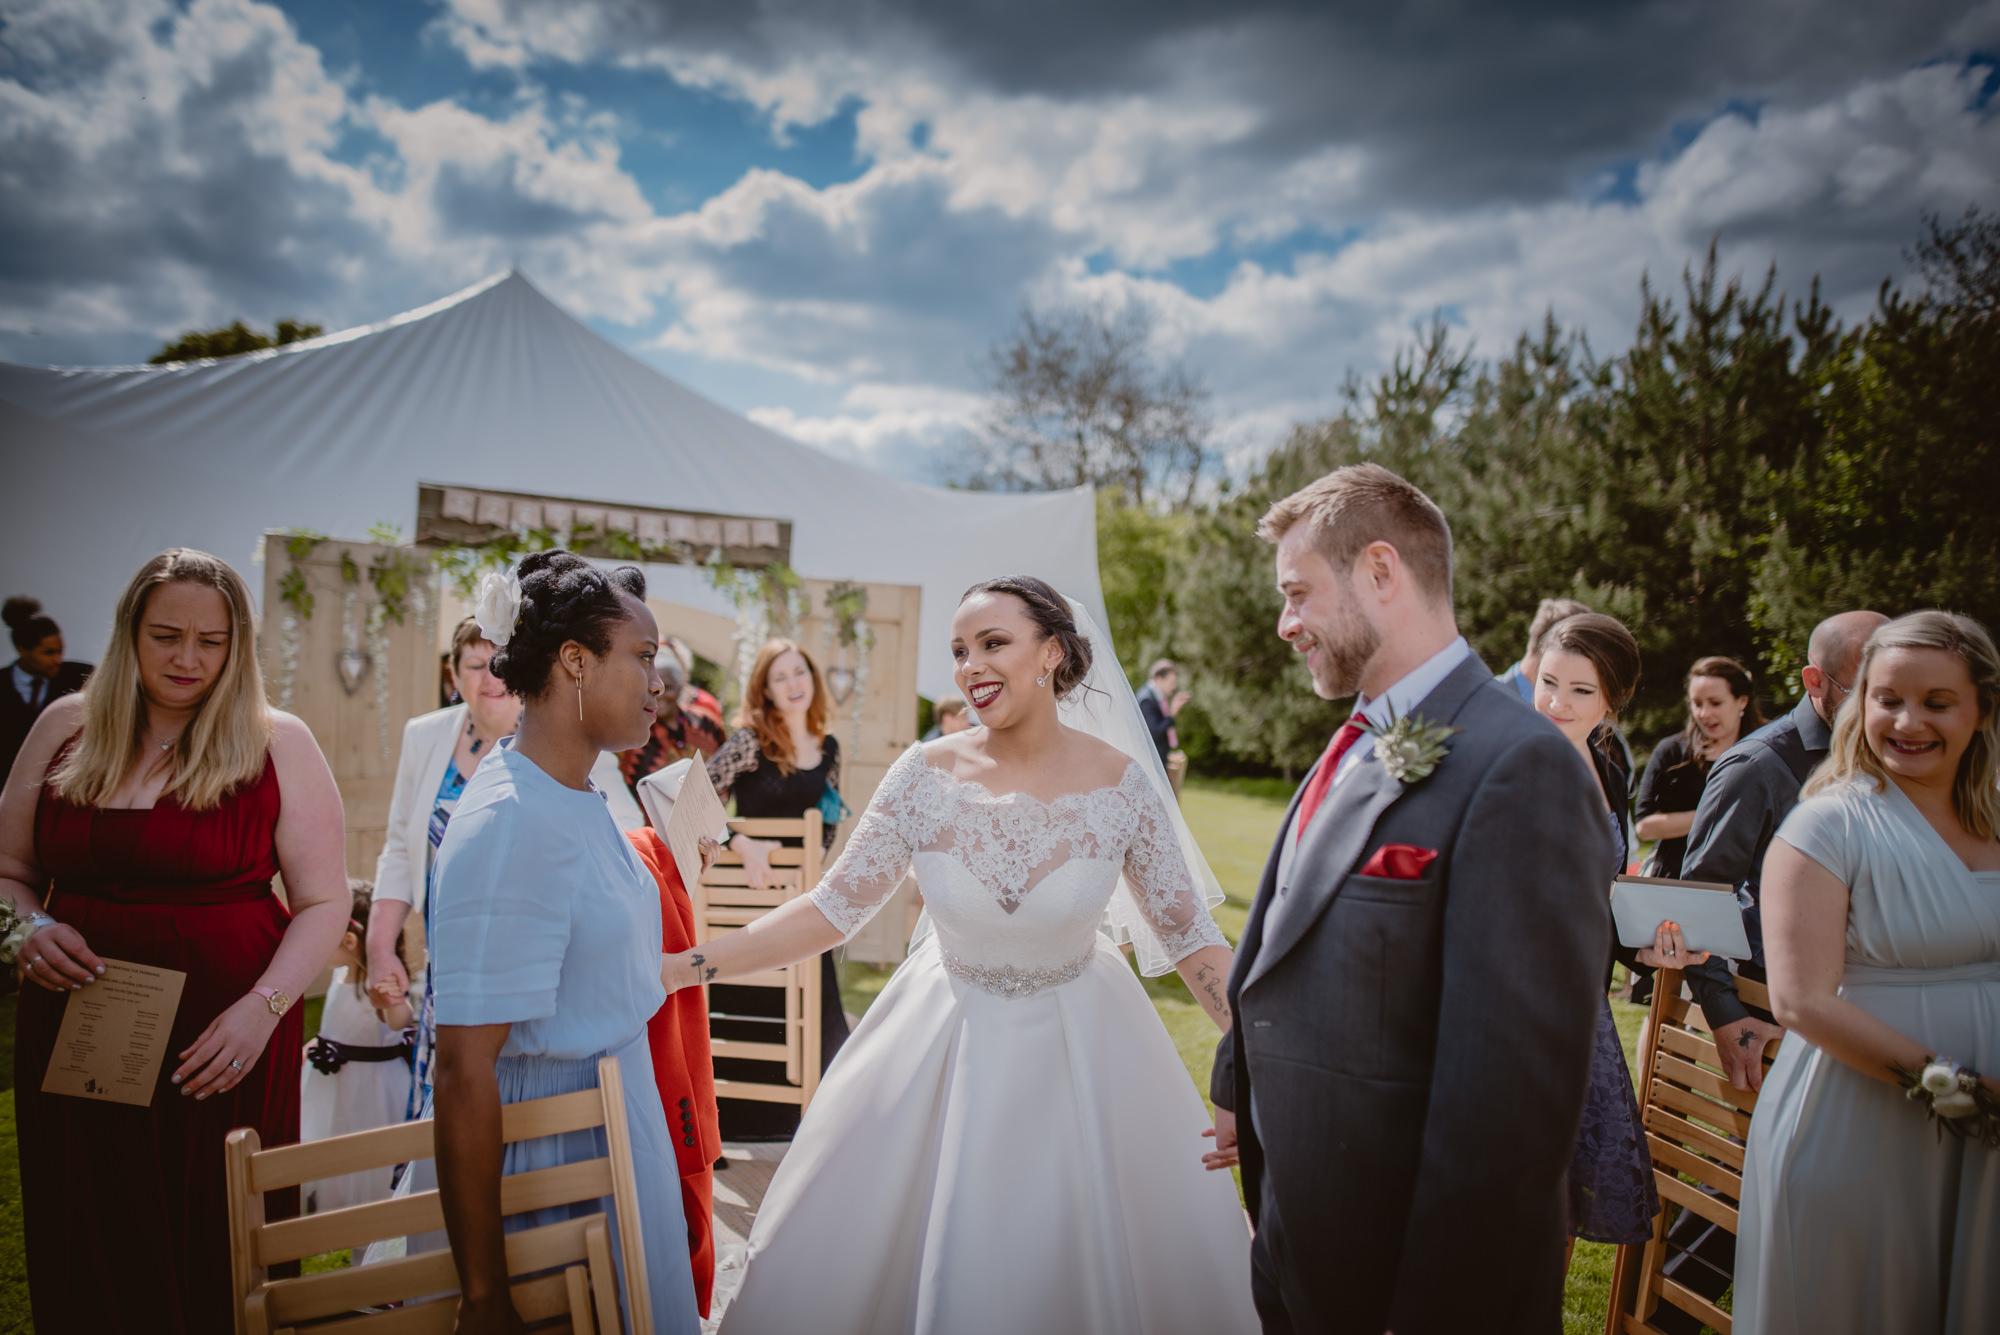 Jacqueline-Gareth-Wedding-Westmead-Events-Surrey-Manu-Mendoza-Wedding-Photography-288.jpg